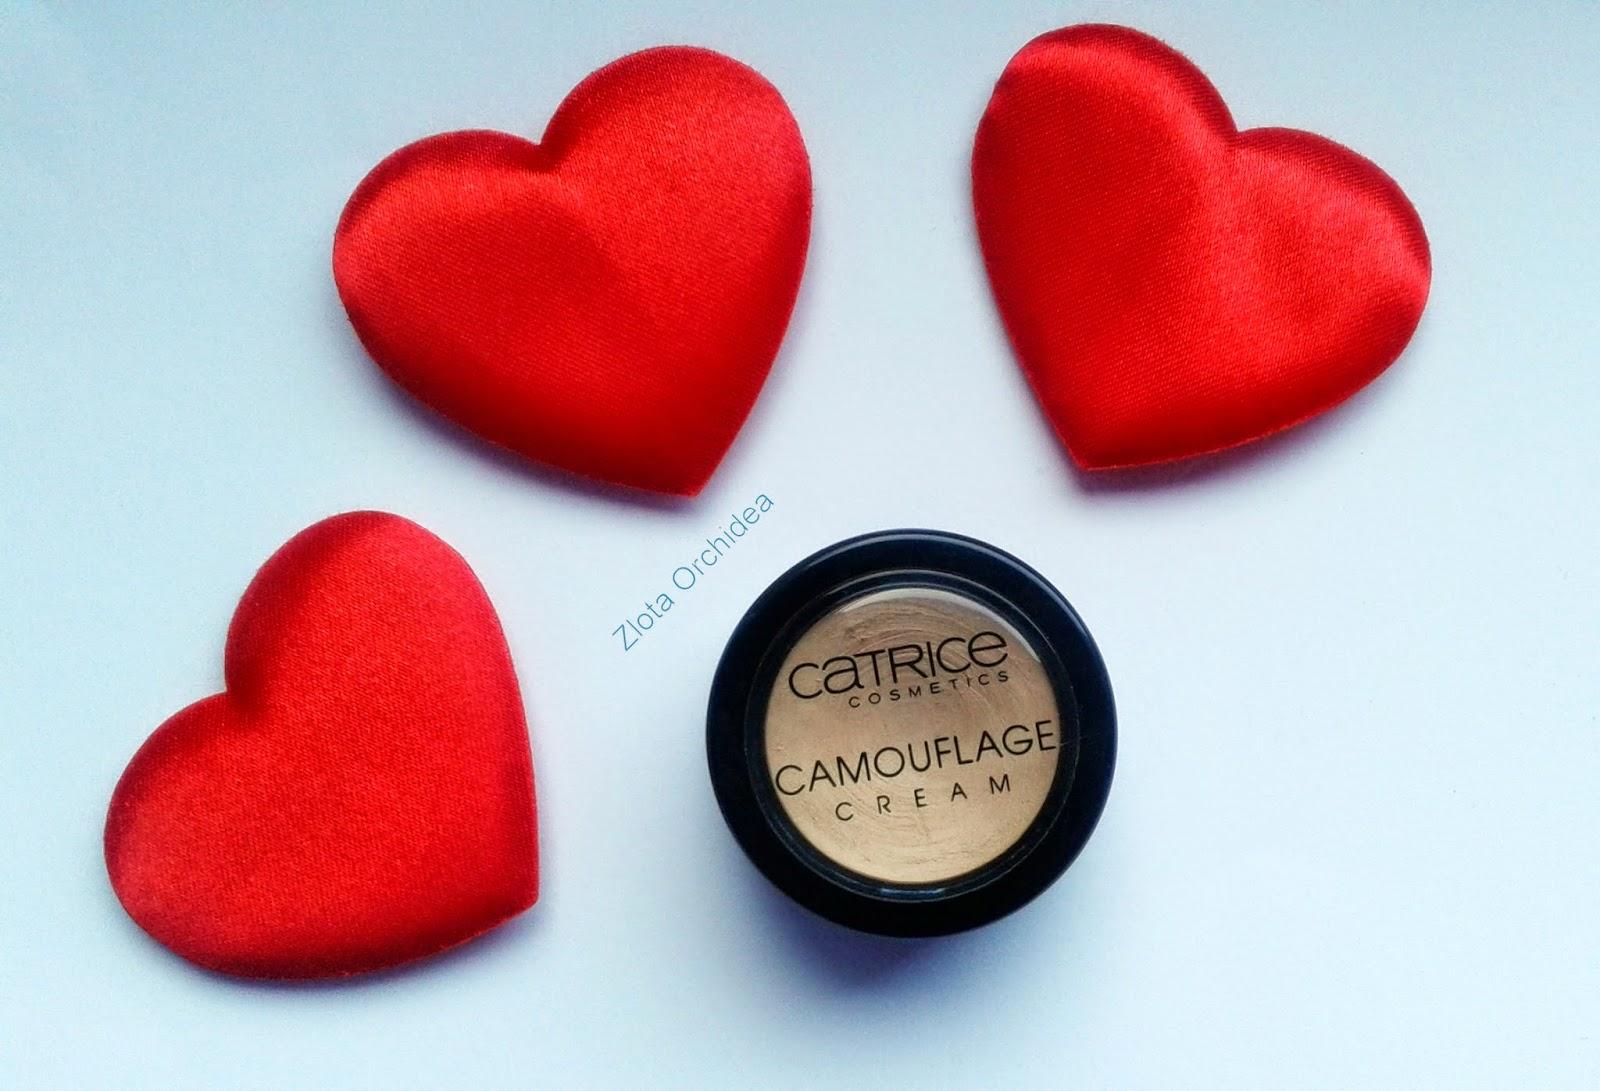 Korektor Catrice-Camouflage Cream